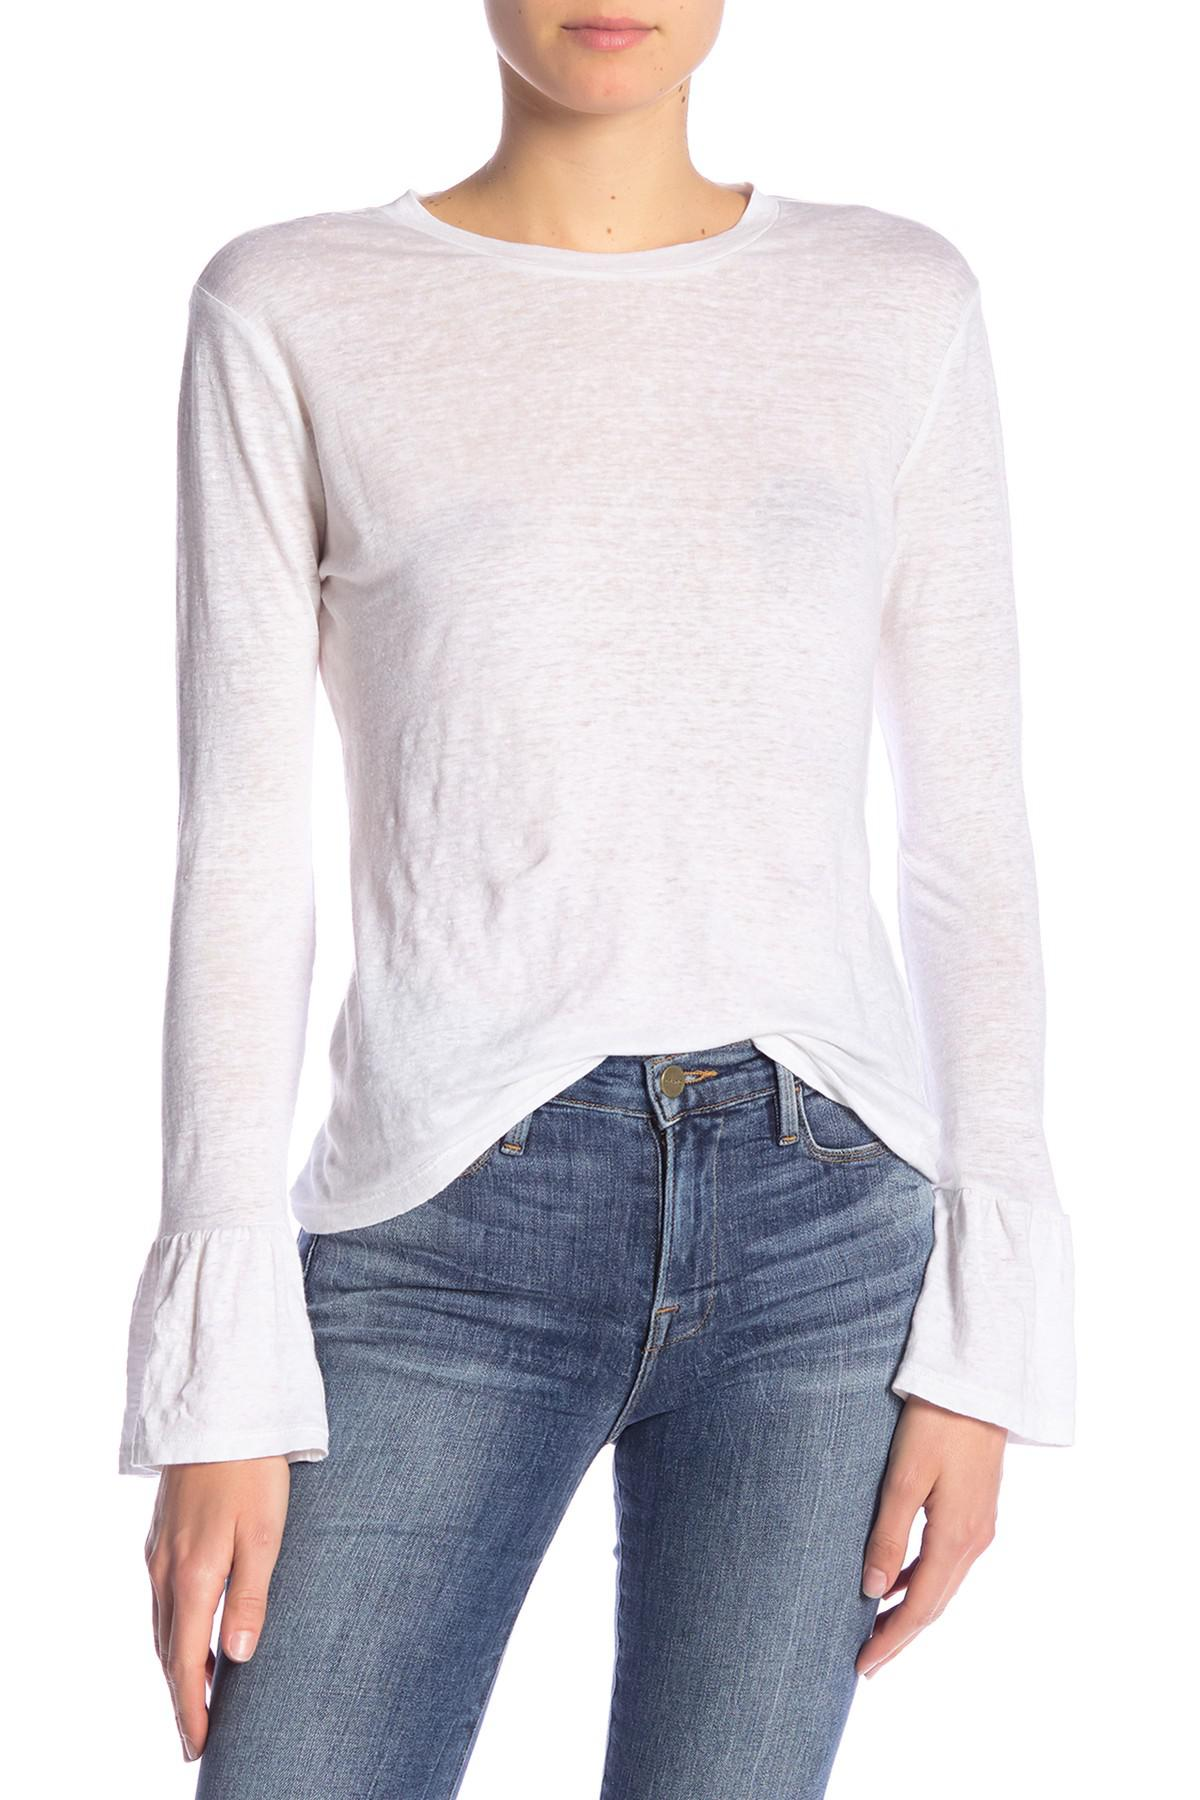 792cbe9427b FRAME Ruffle Cuff Long Sleeve Linen Shirt in White - Lyst